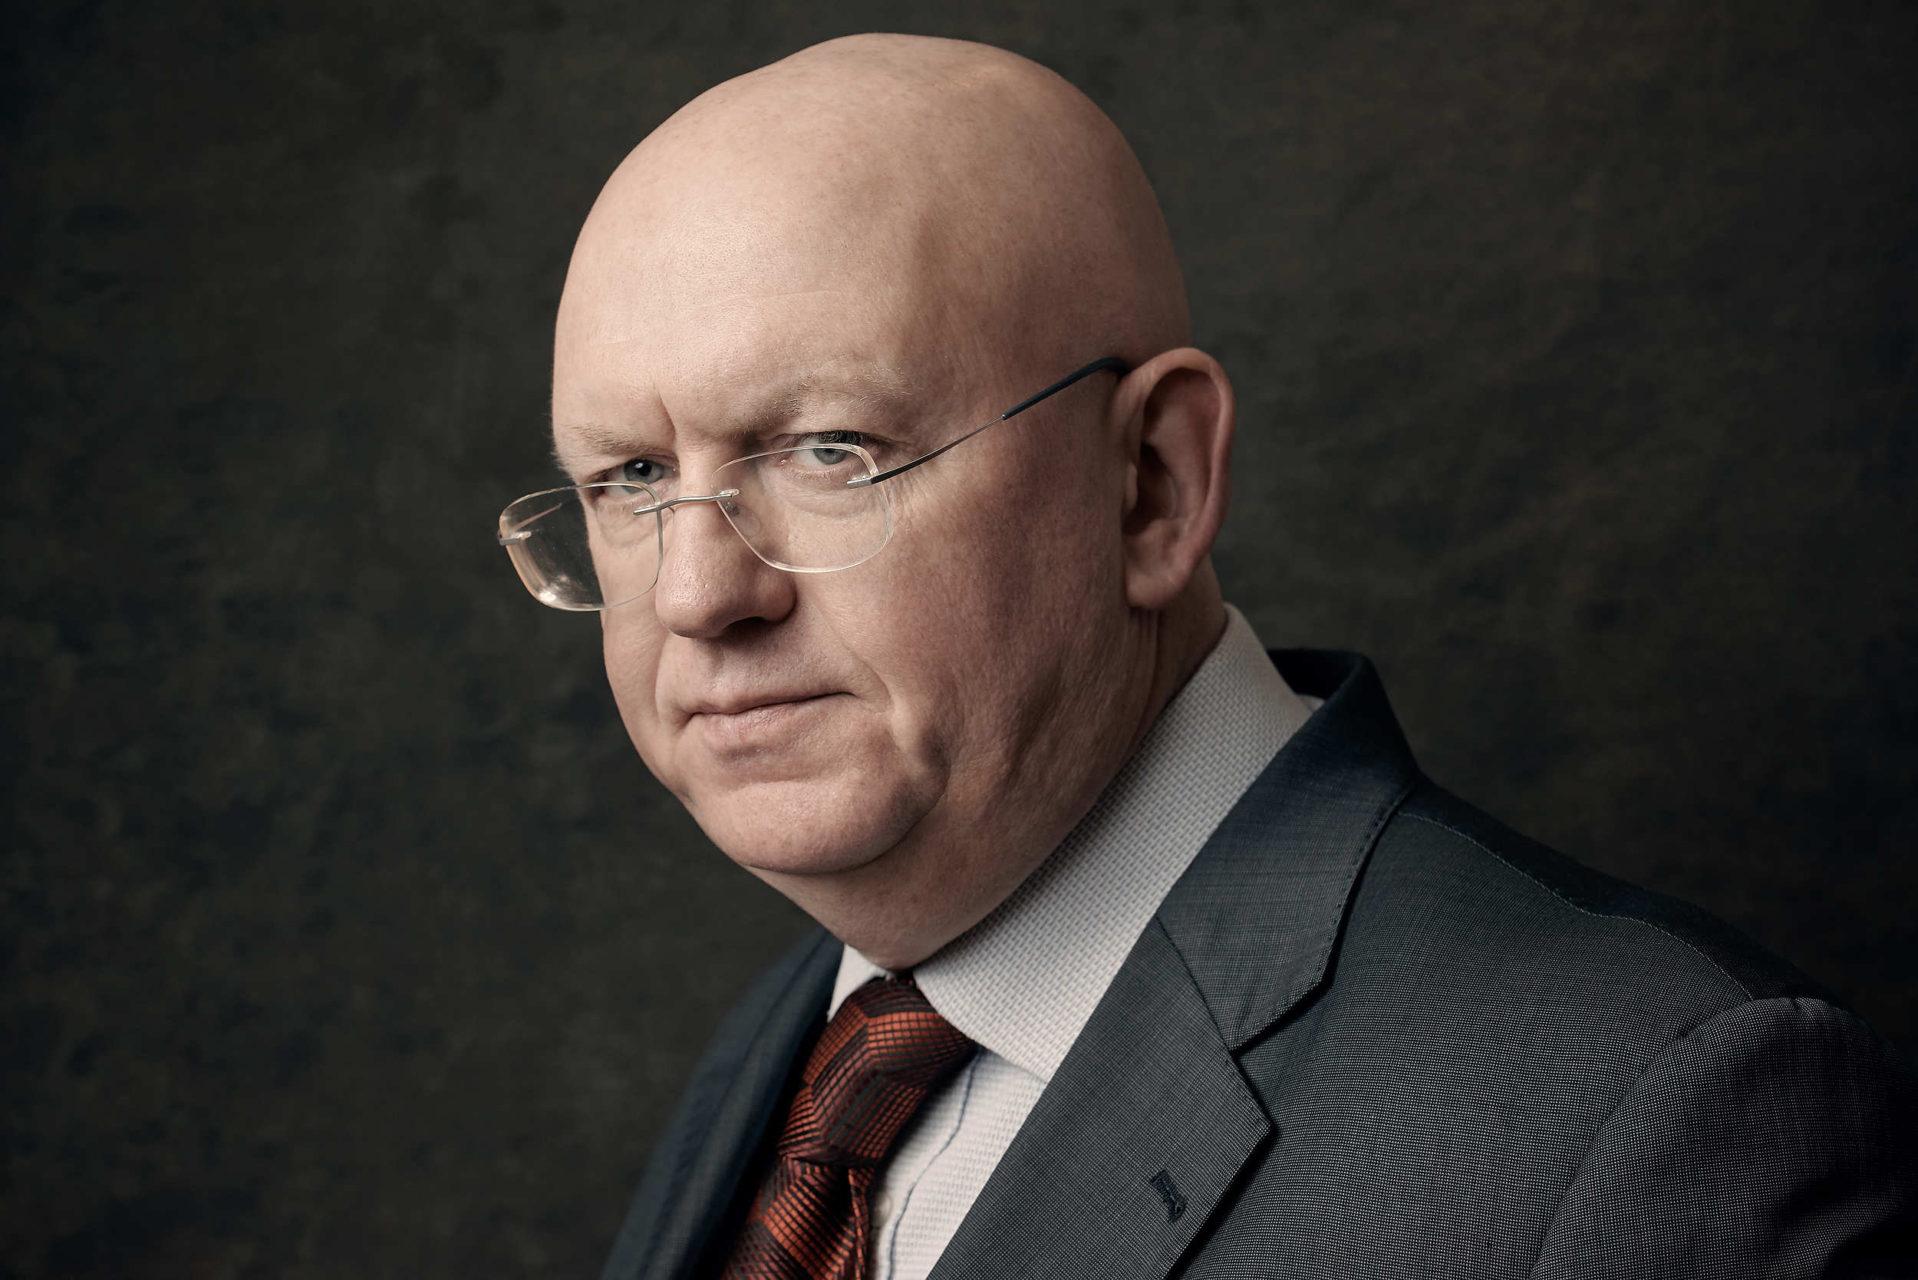 Vasiliy Nebenzya, Russia's Ambassador to the UN